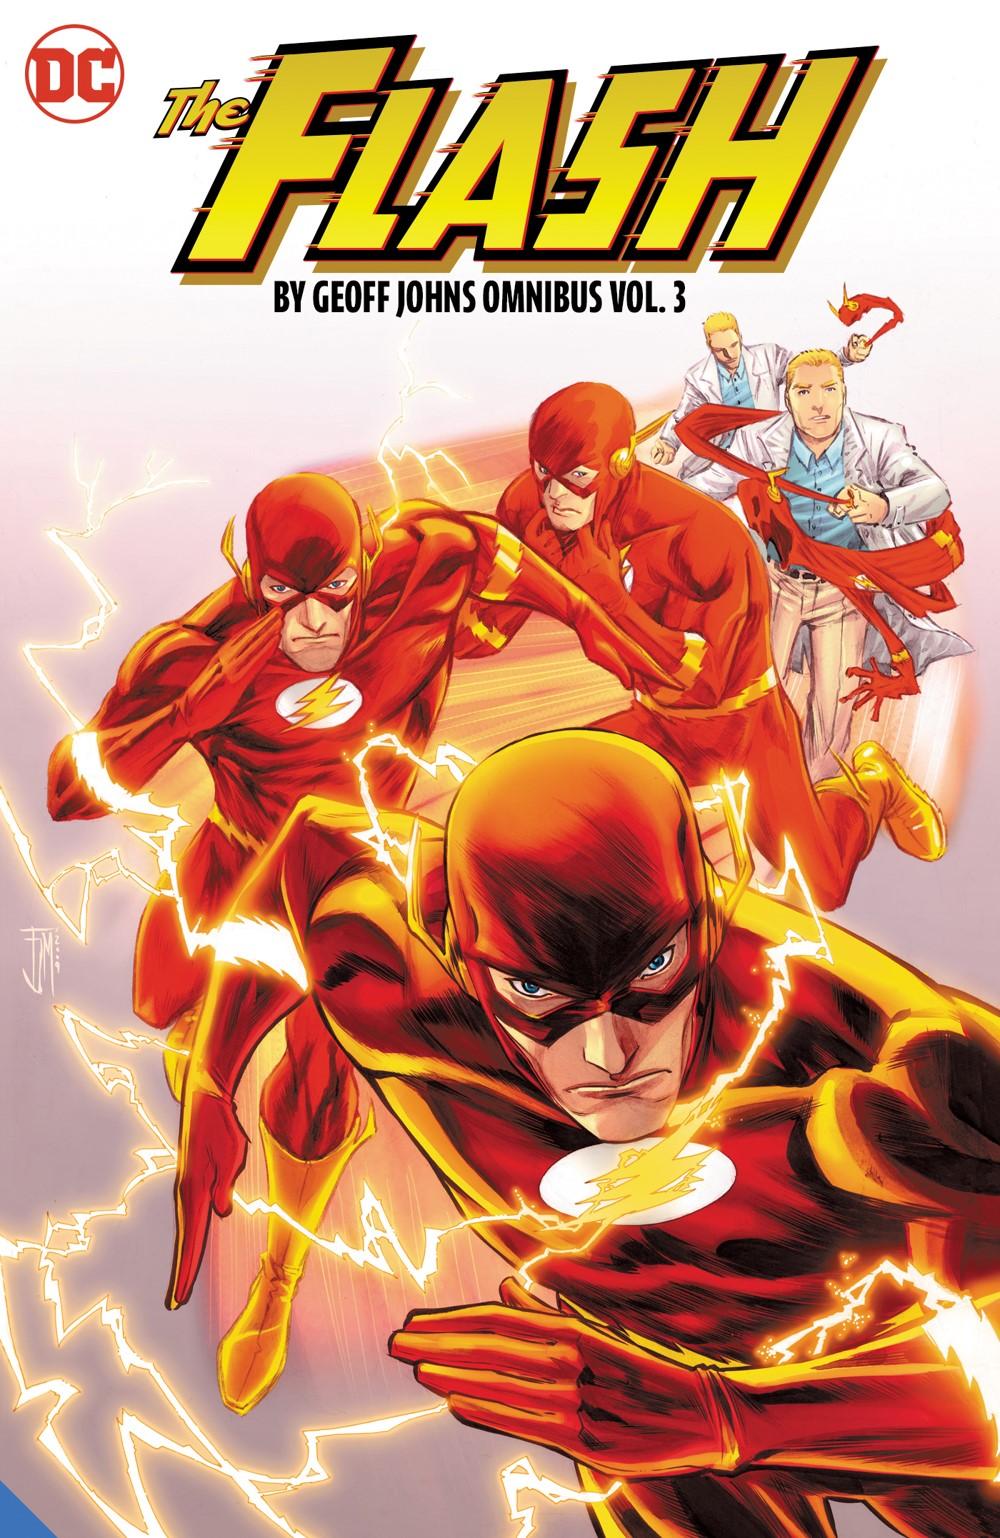 theflash_byGeoffJohns-omni-vol3 DC Comics November 2021 Solicitations